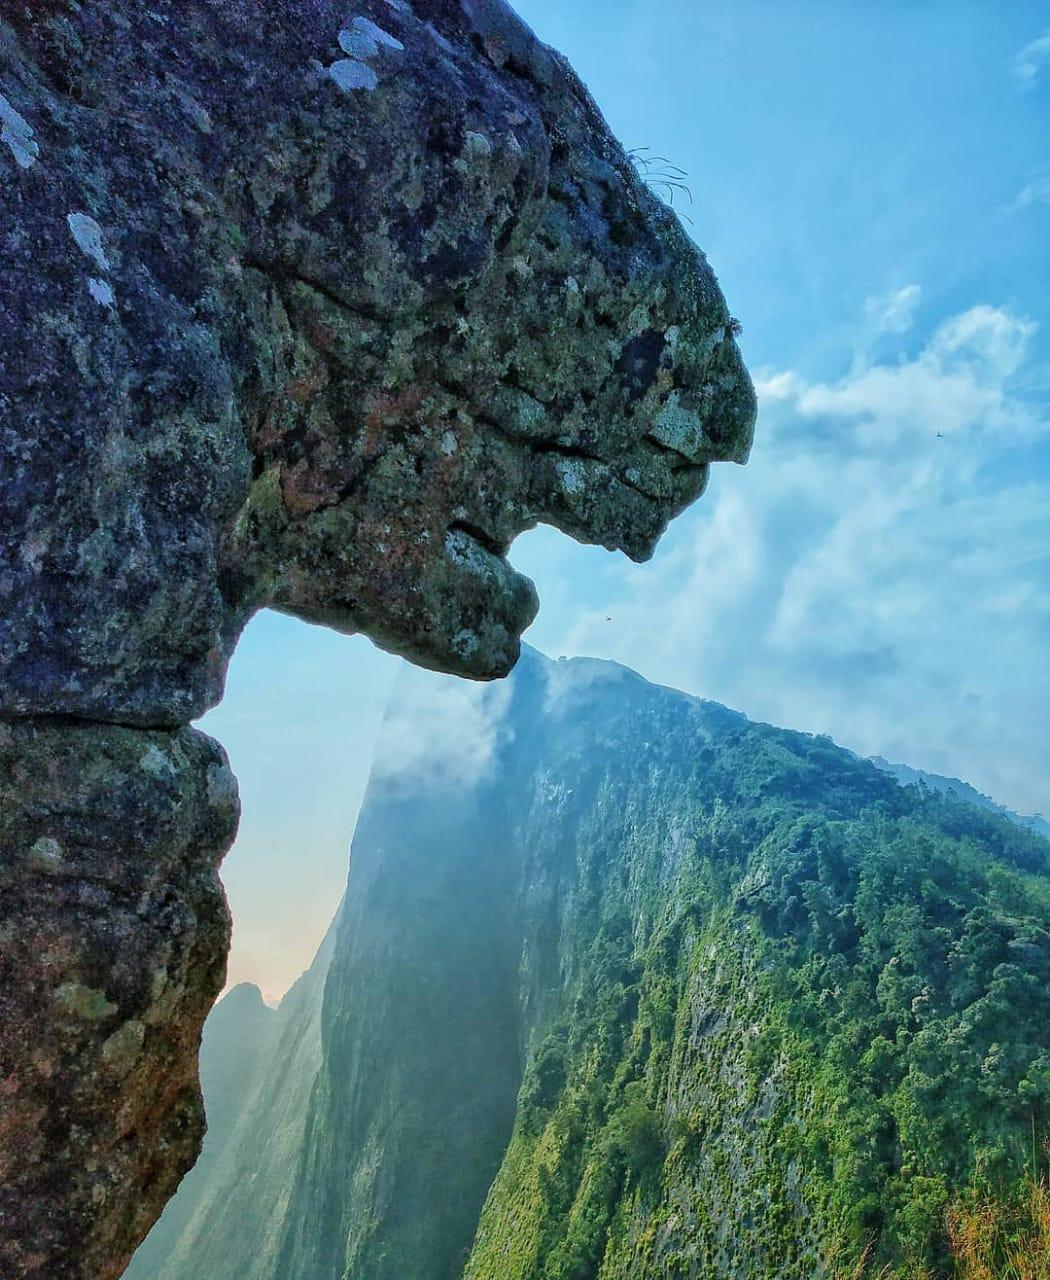 #Meesapulimala #Trek - The Best Trek of Idukki in Kerala